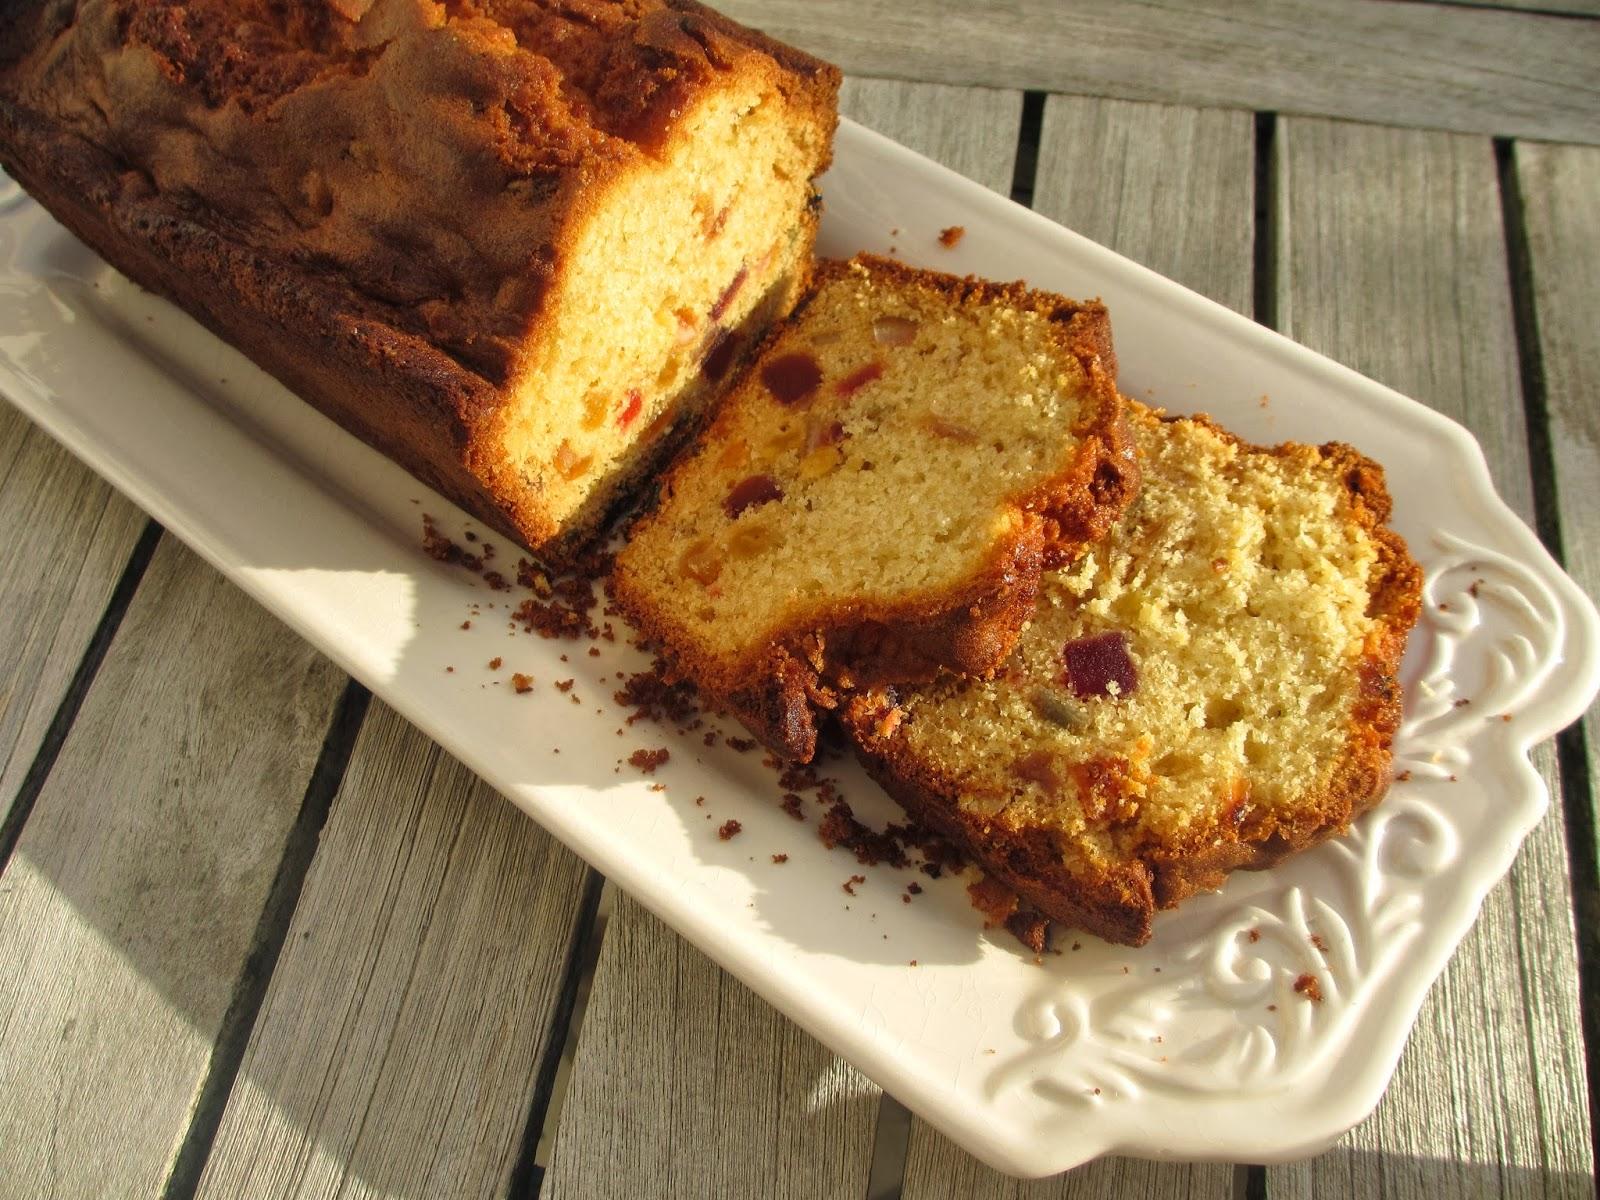 Cake Aux Fruits Confits Thermomix